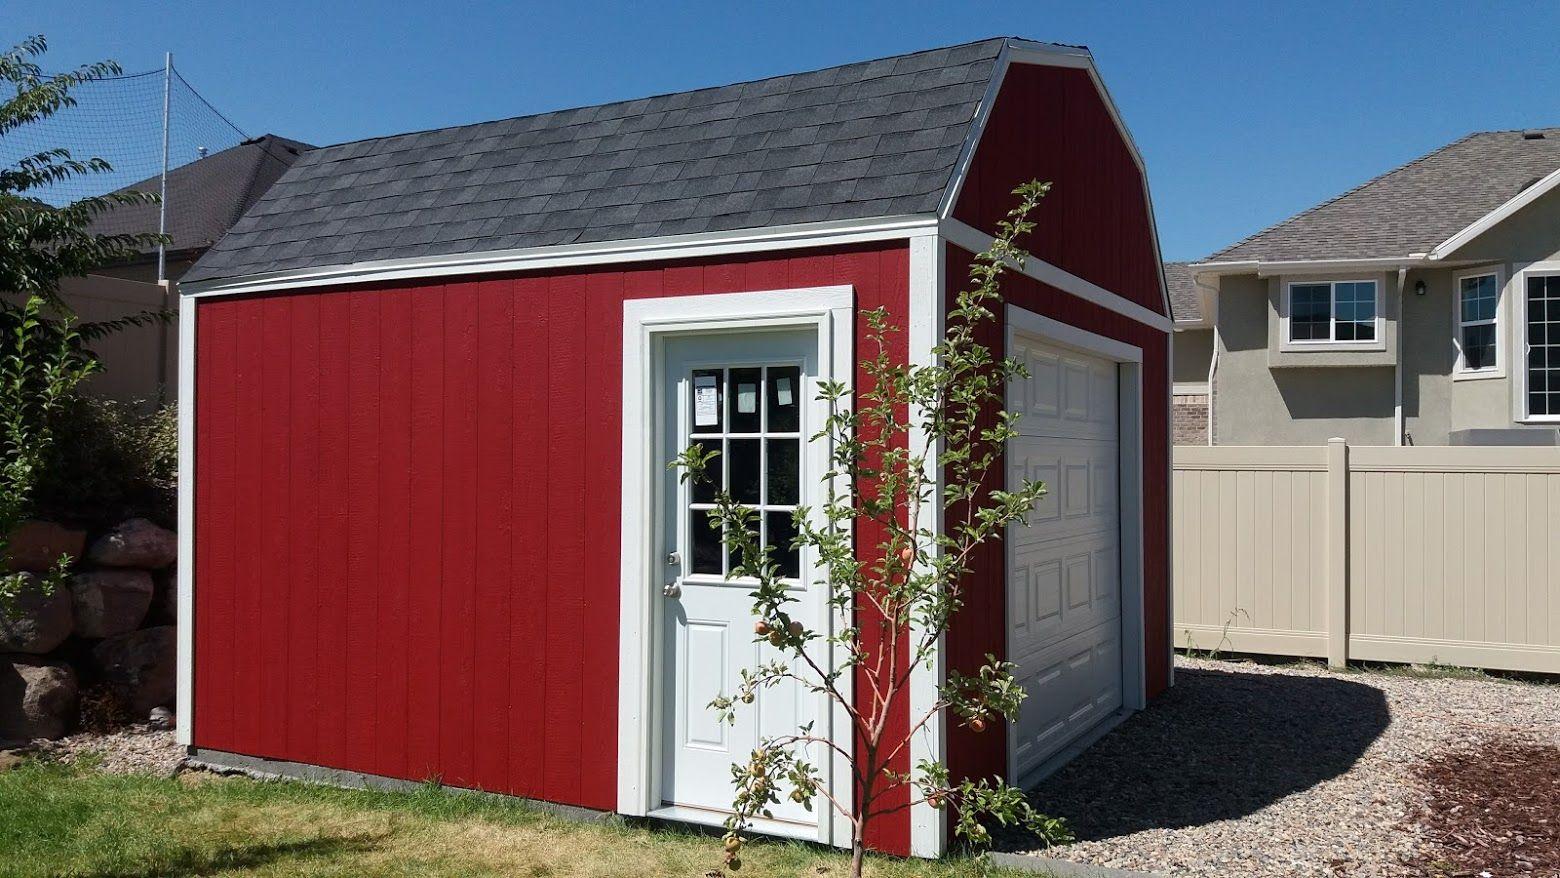 Garden Sheds 14 X 14 X 12 Barn Style Garage Door Loft Include Www Shedsbuilders Com Lehi Utah Shed Builders Backyard Buildings Custom Sheds